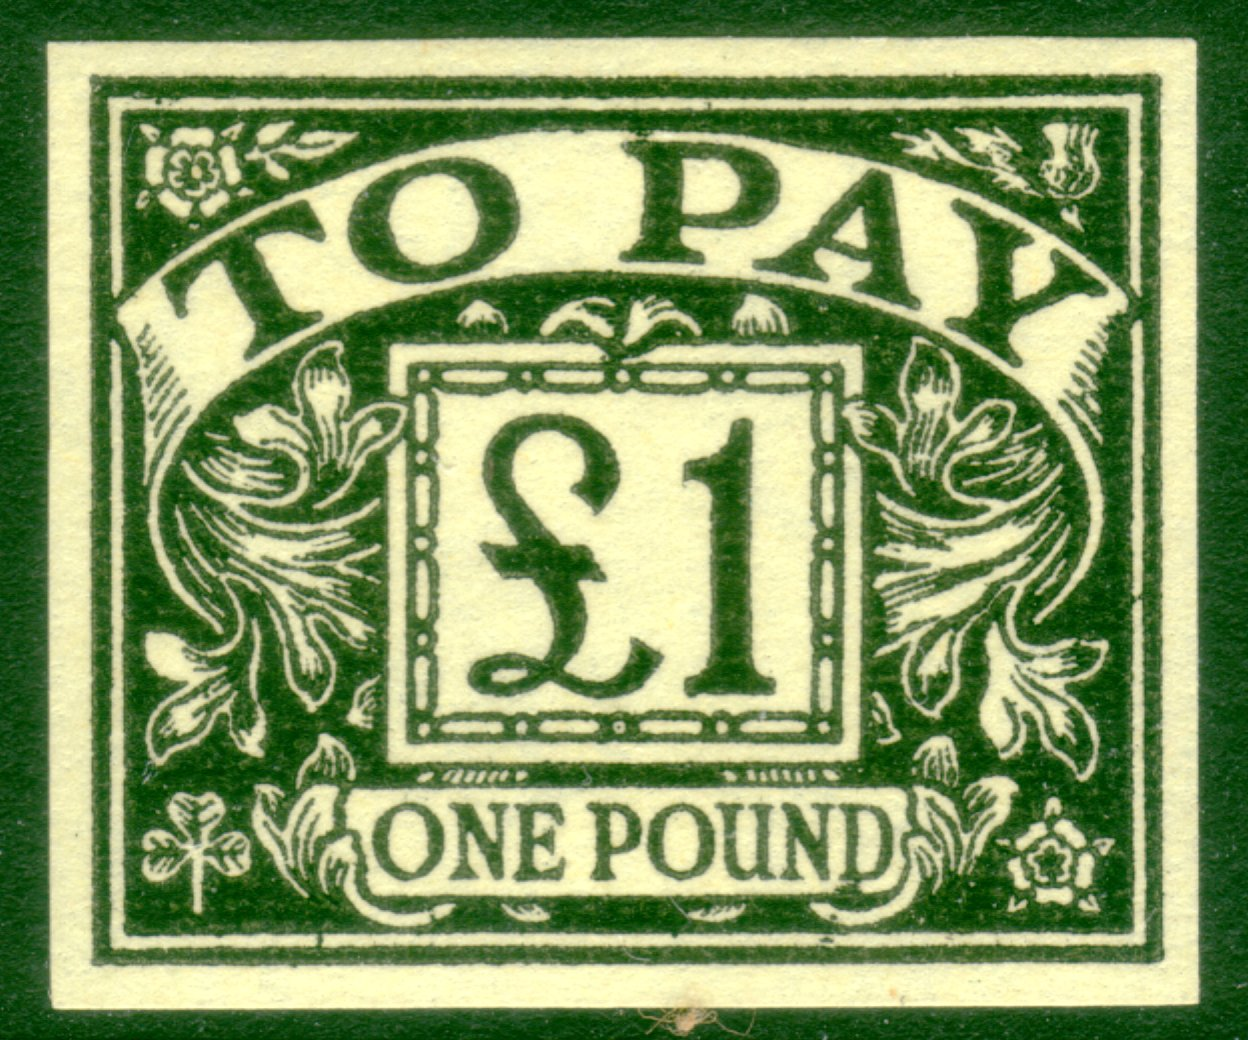 1963 £1 black on yellow superb UMM postage due imprimatur NPM archives.